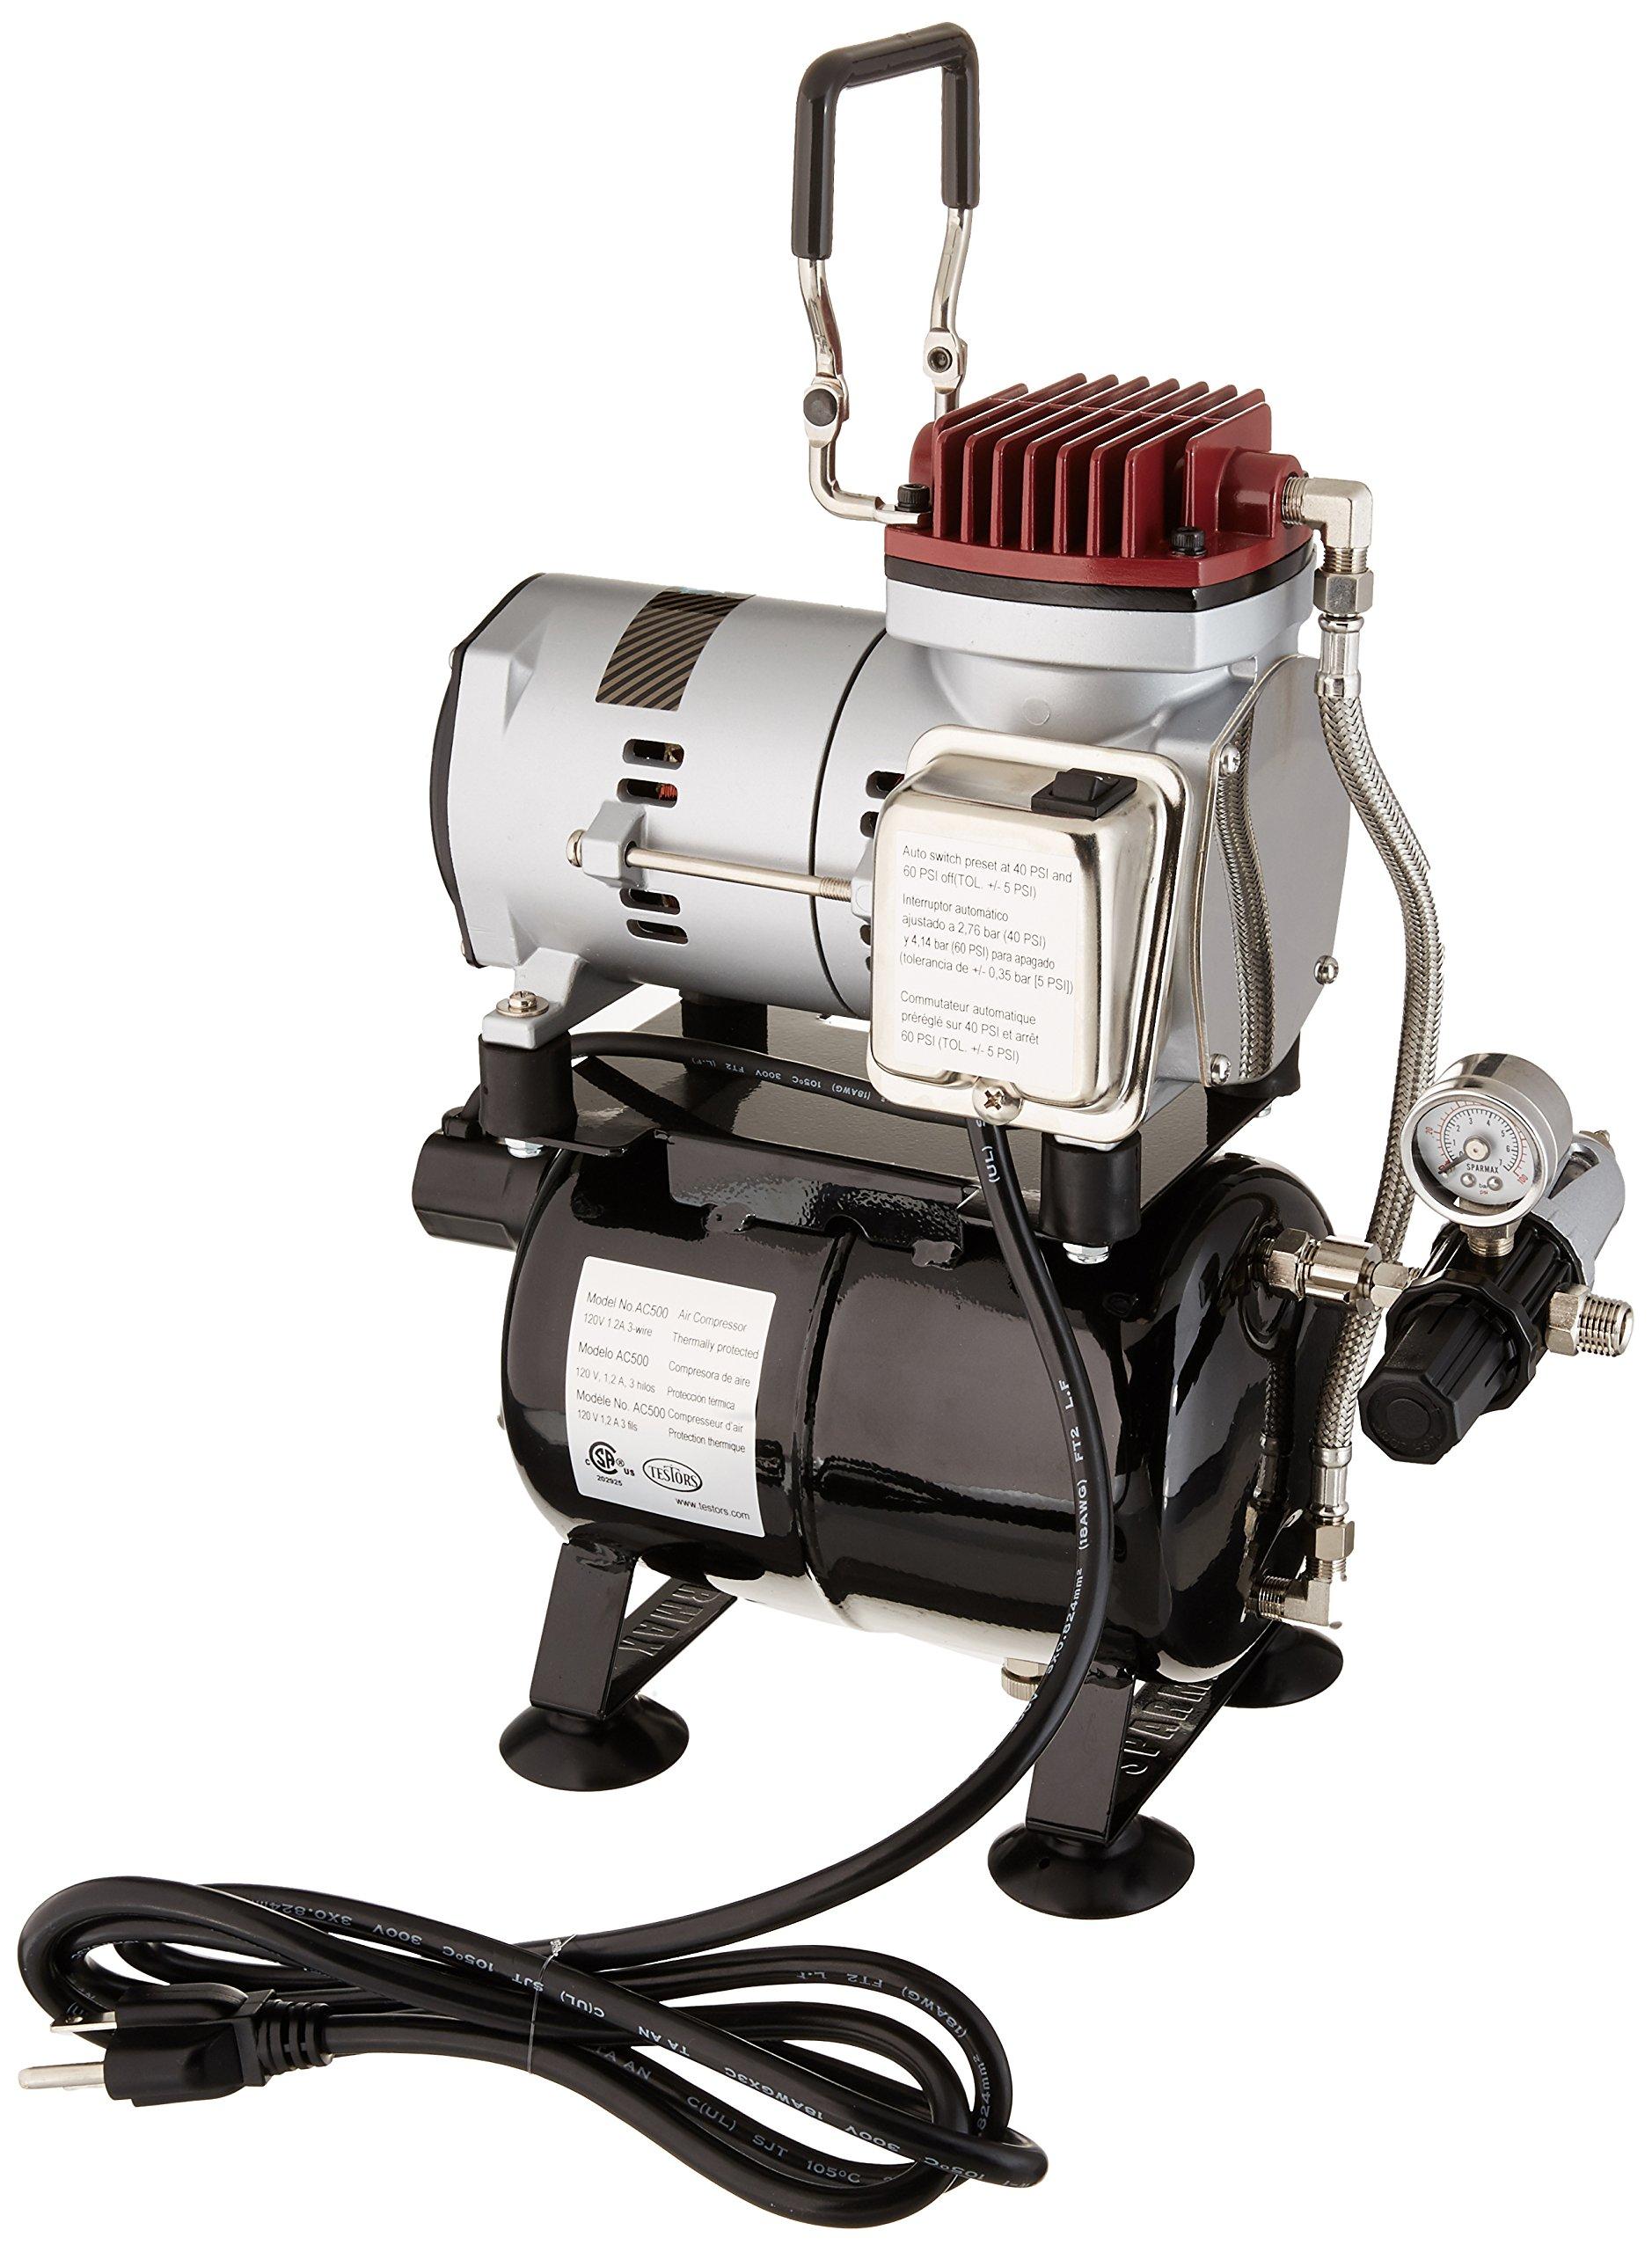 Testors All New AC500 Airbrush Compressor